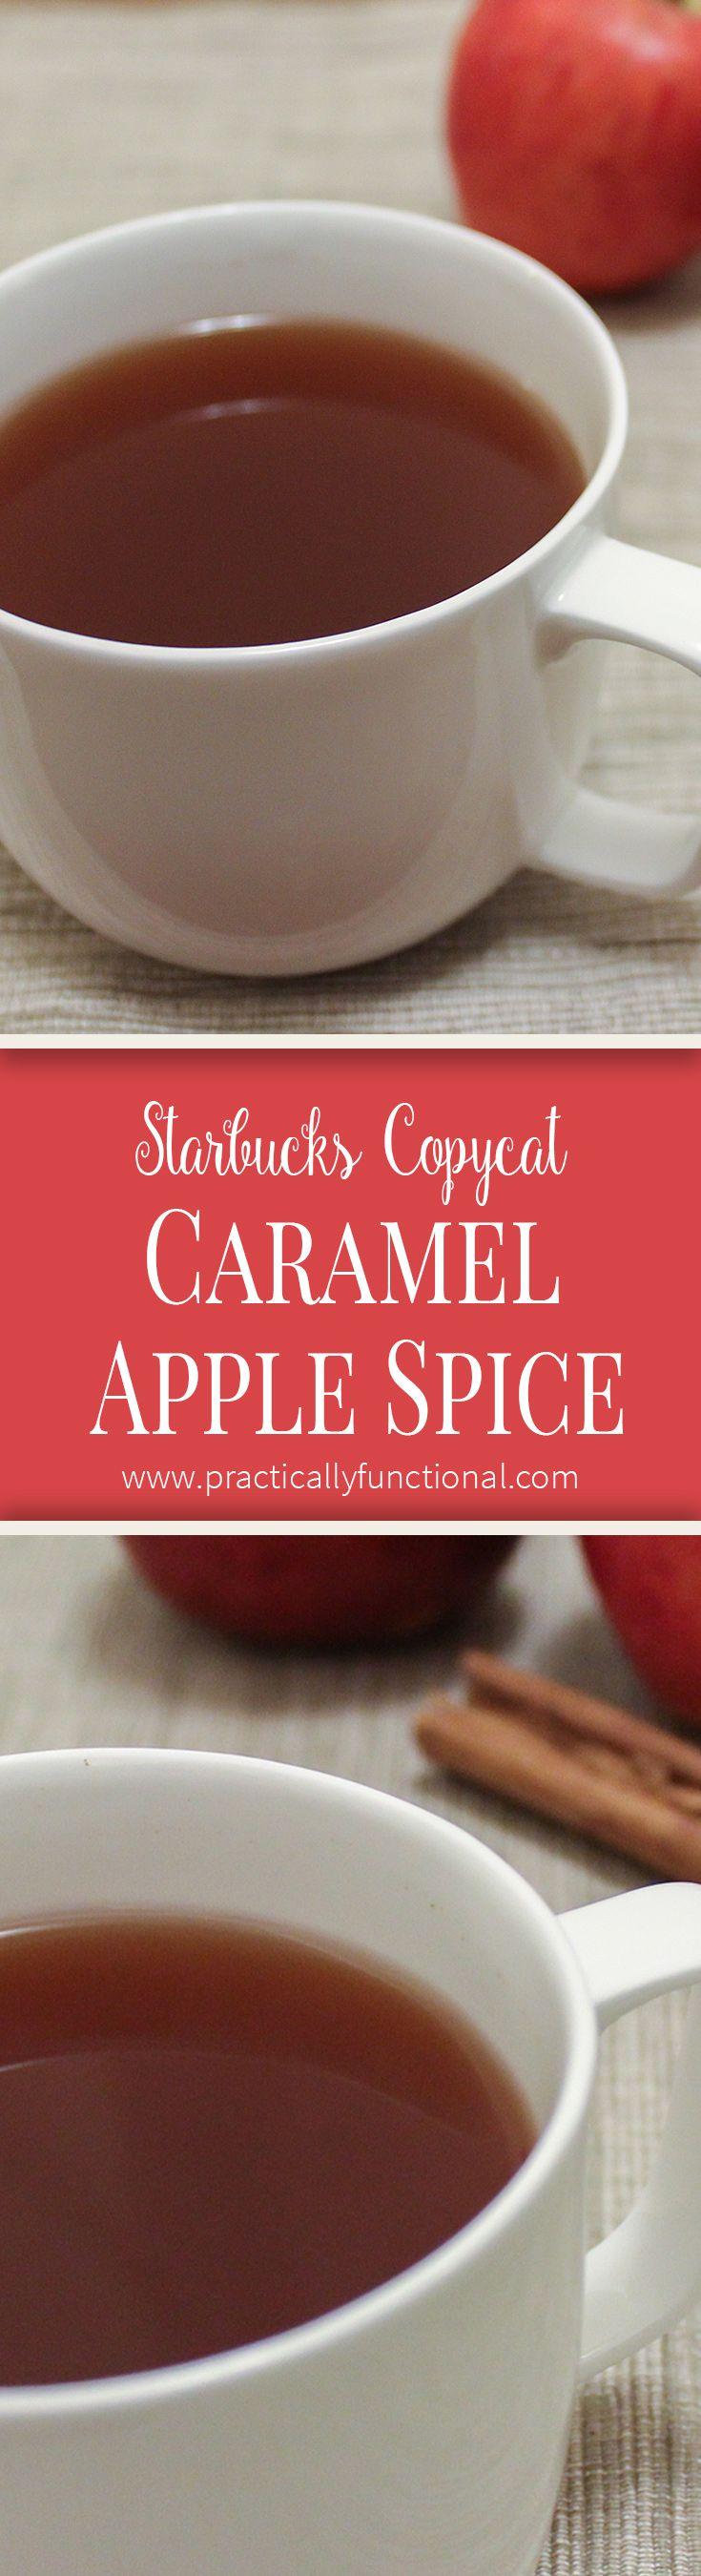 Caramel apple spice in the slow cooker starbucks copycat